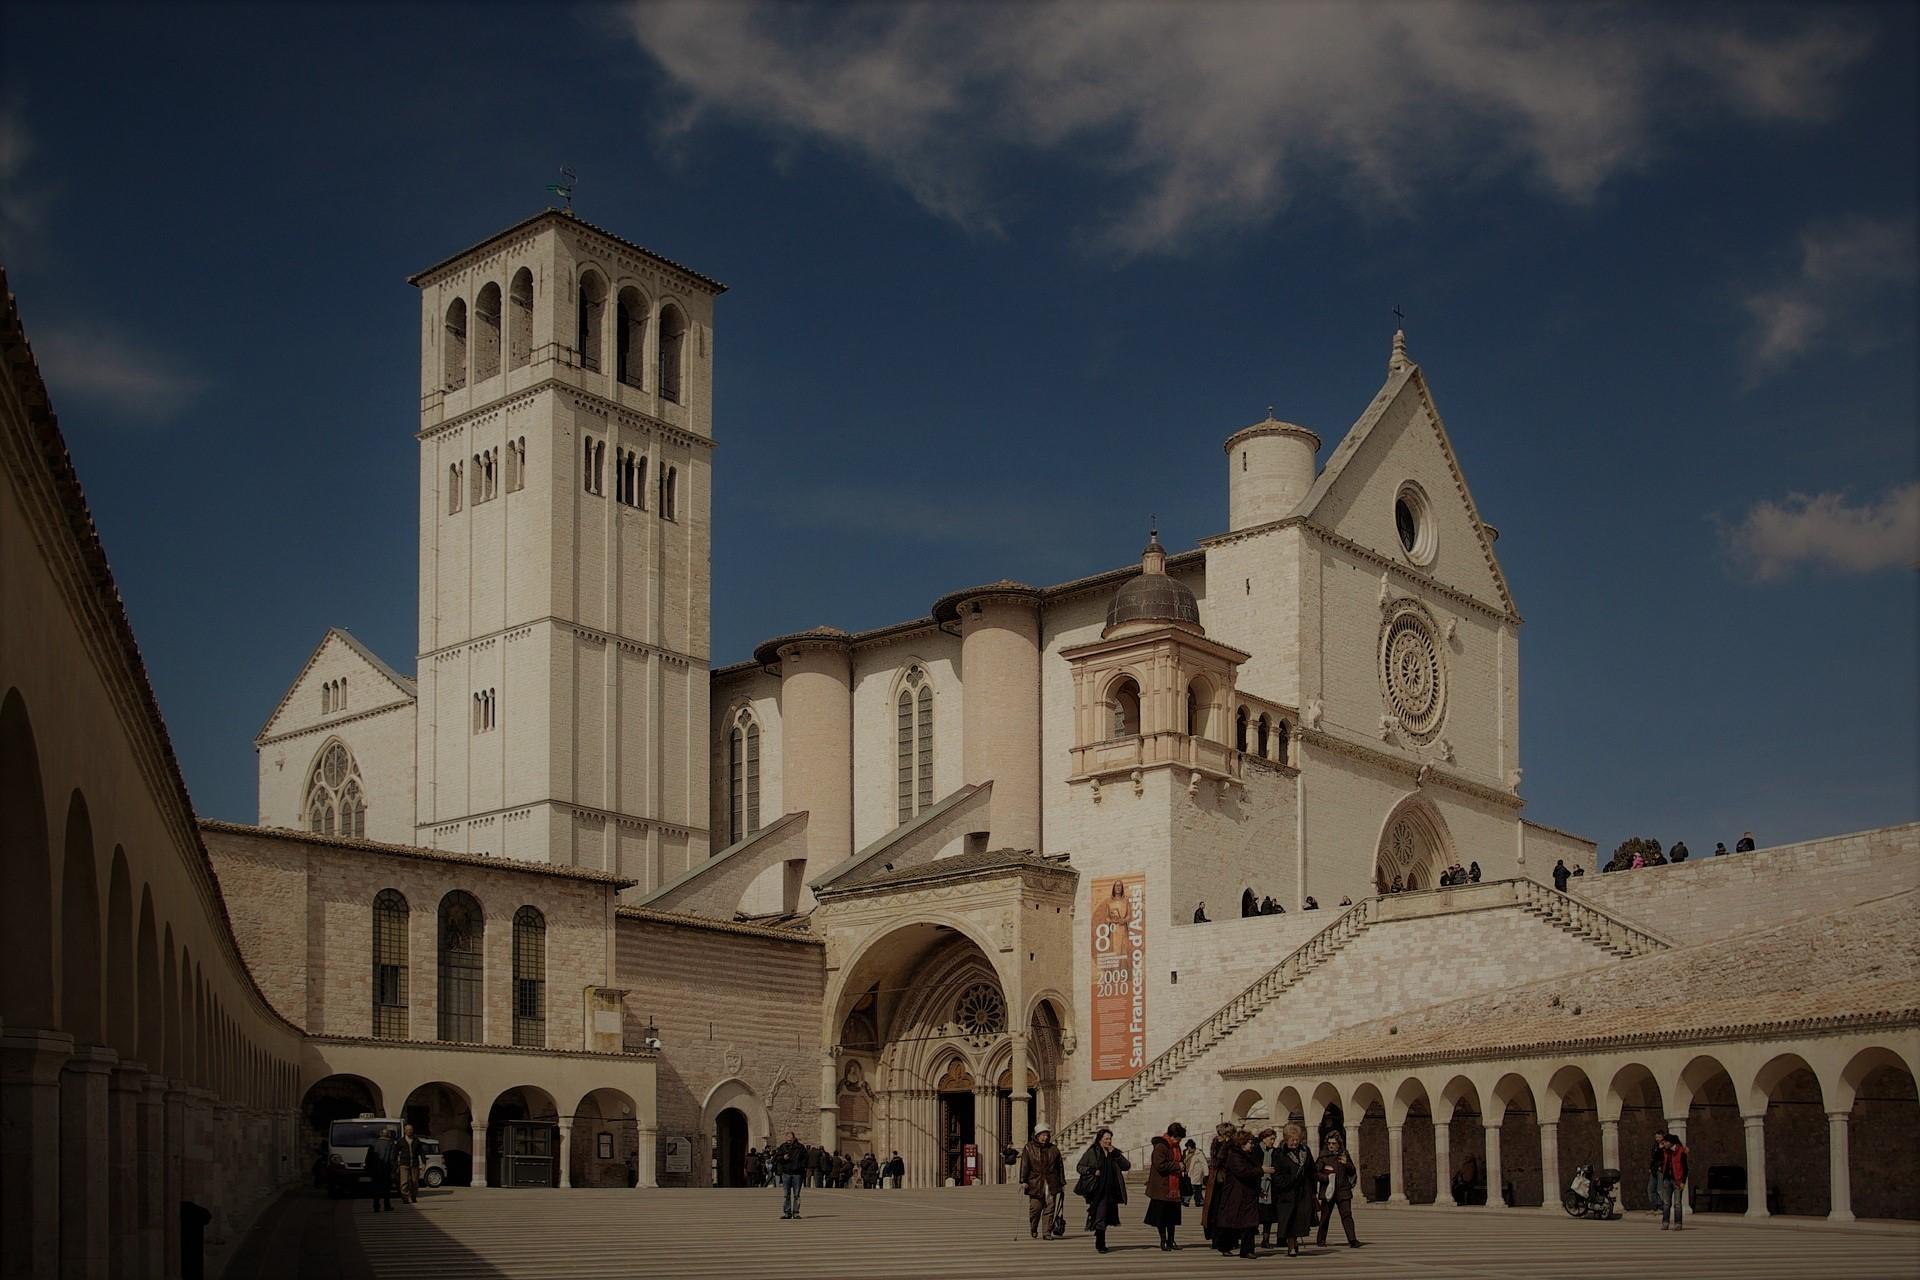 basilica-536308_1920 (3).jpg